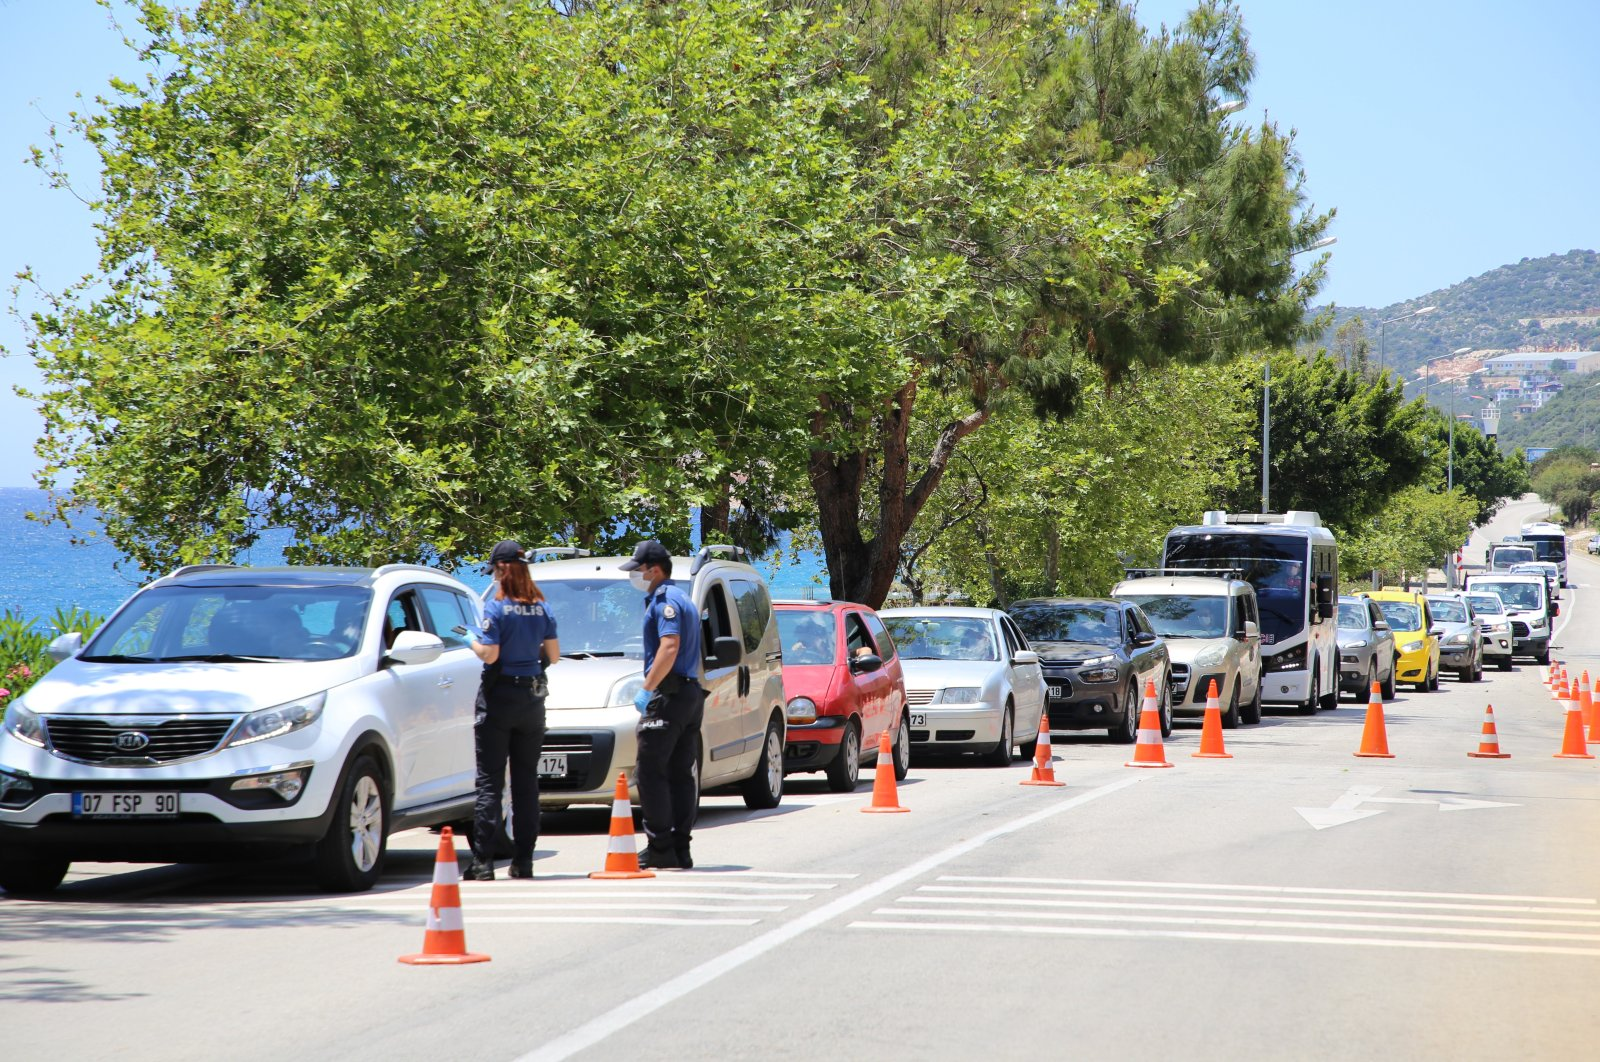 Police inspect vehicles entering Kaş district, in Antalya, Turkey, June 2, 2020. (İHA Photo)